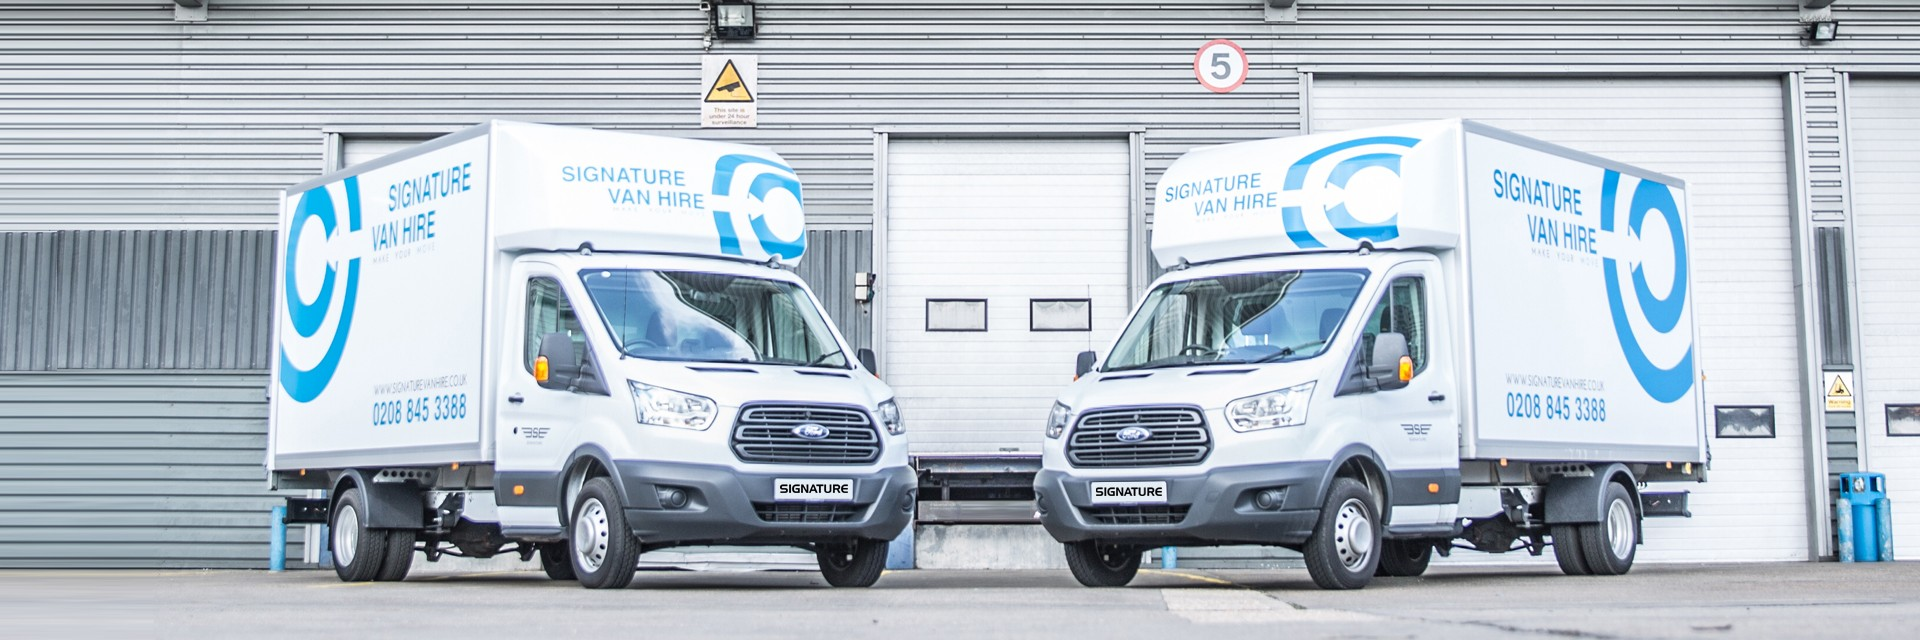 Why Rent a Luton Van from Signature Van Hire?